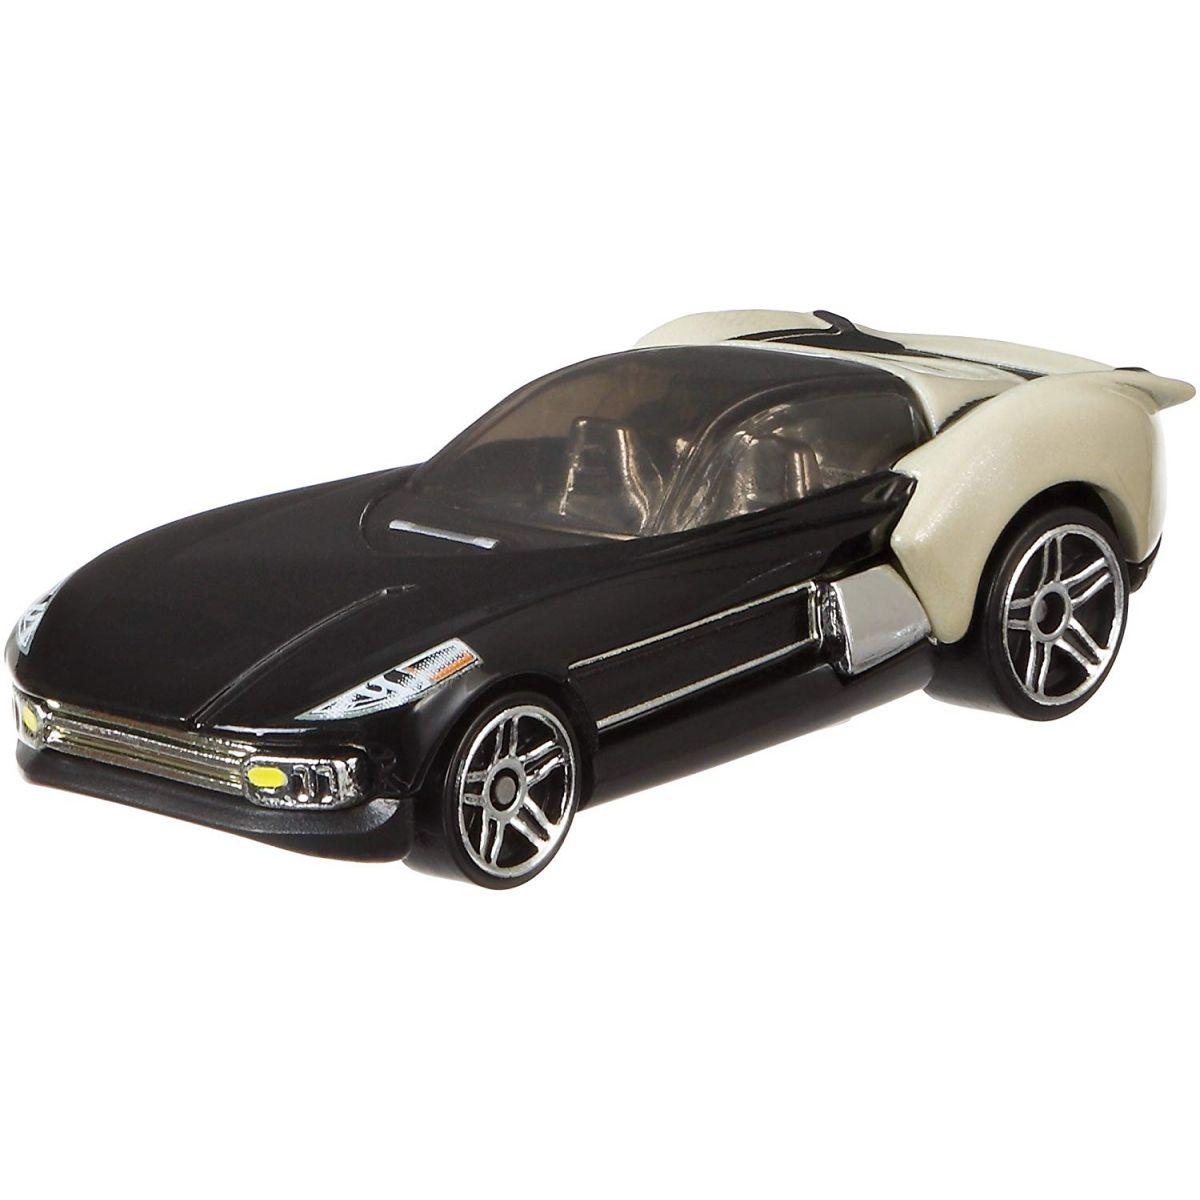 Mattel Hot Wheels tematické auto – Star Wars QI'RA